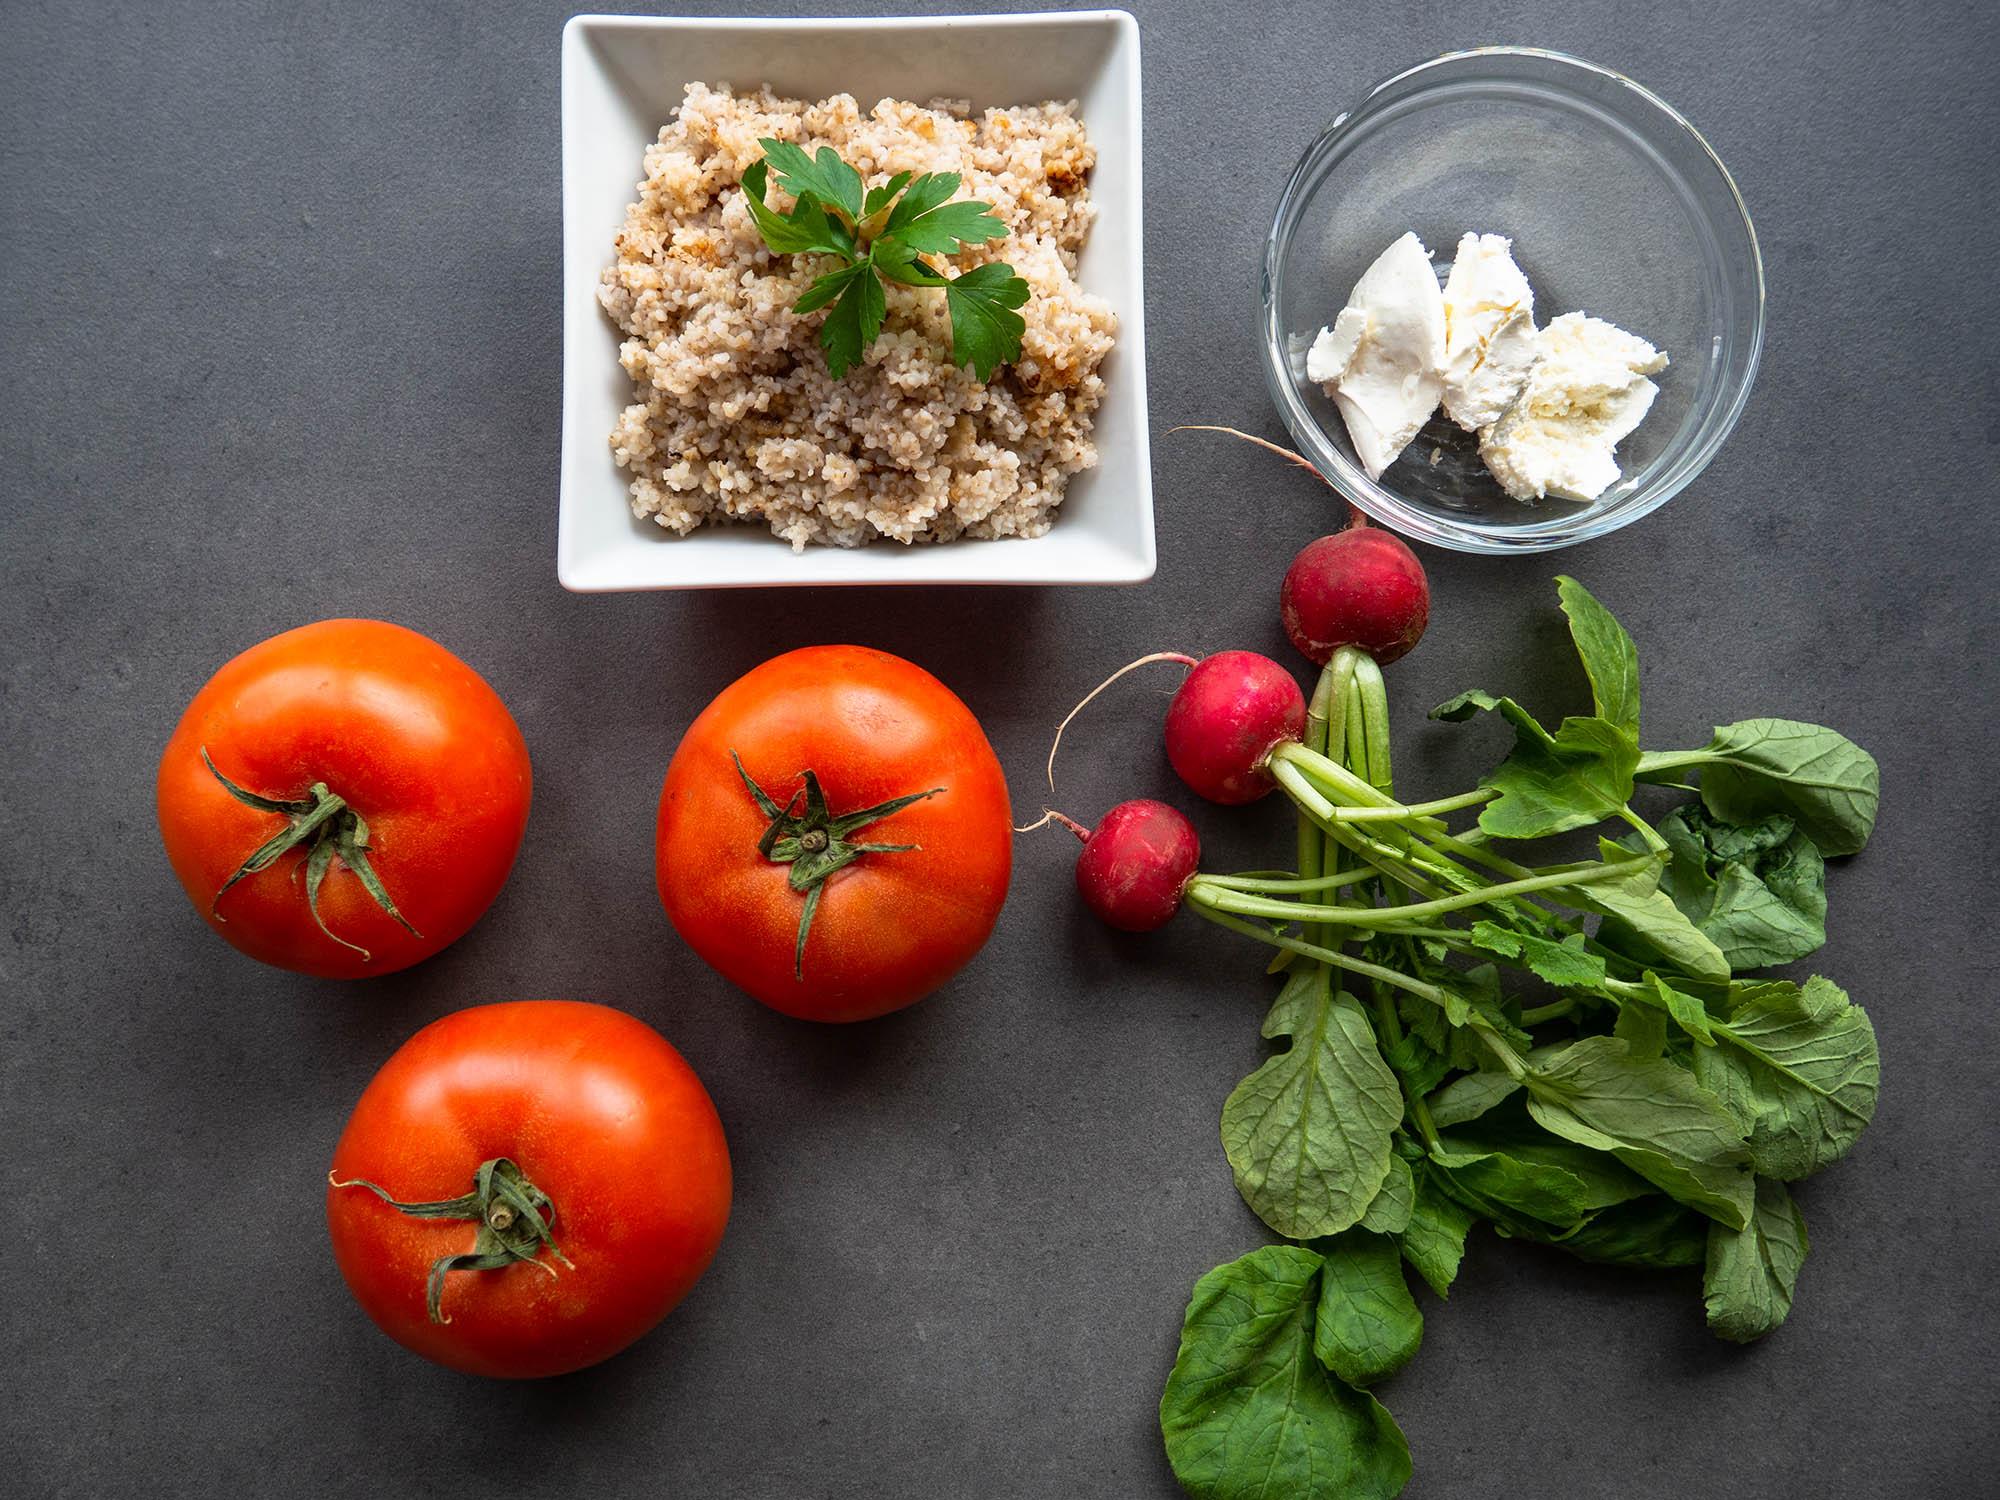 3 tomatoes, barley groats, fresh dill, radishes, Philadelphia cheese